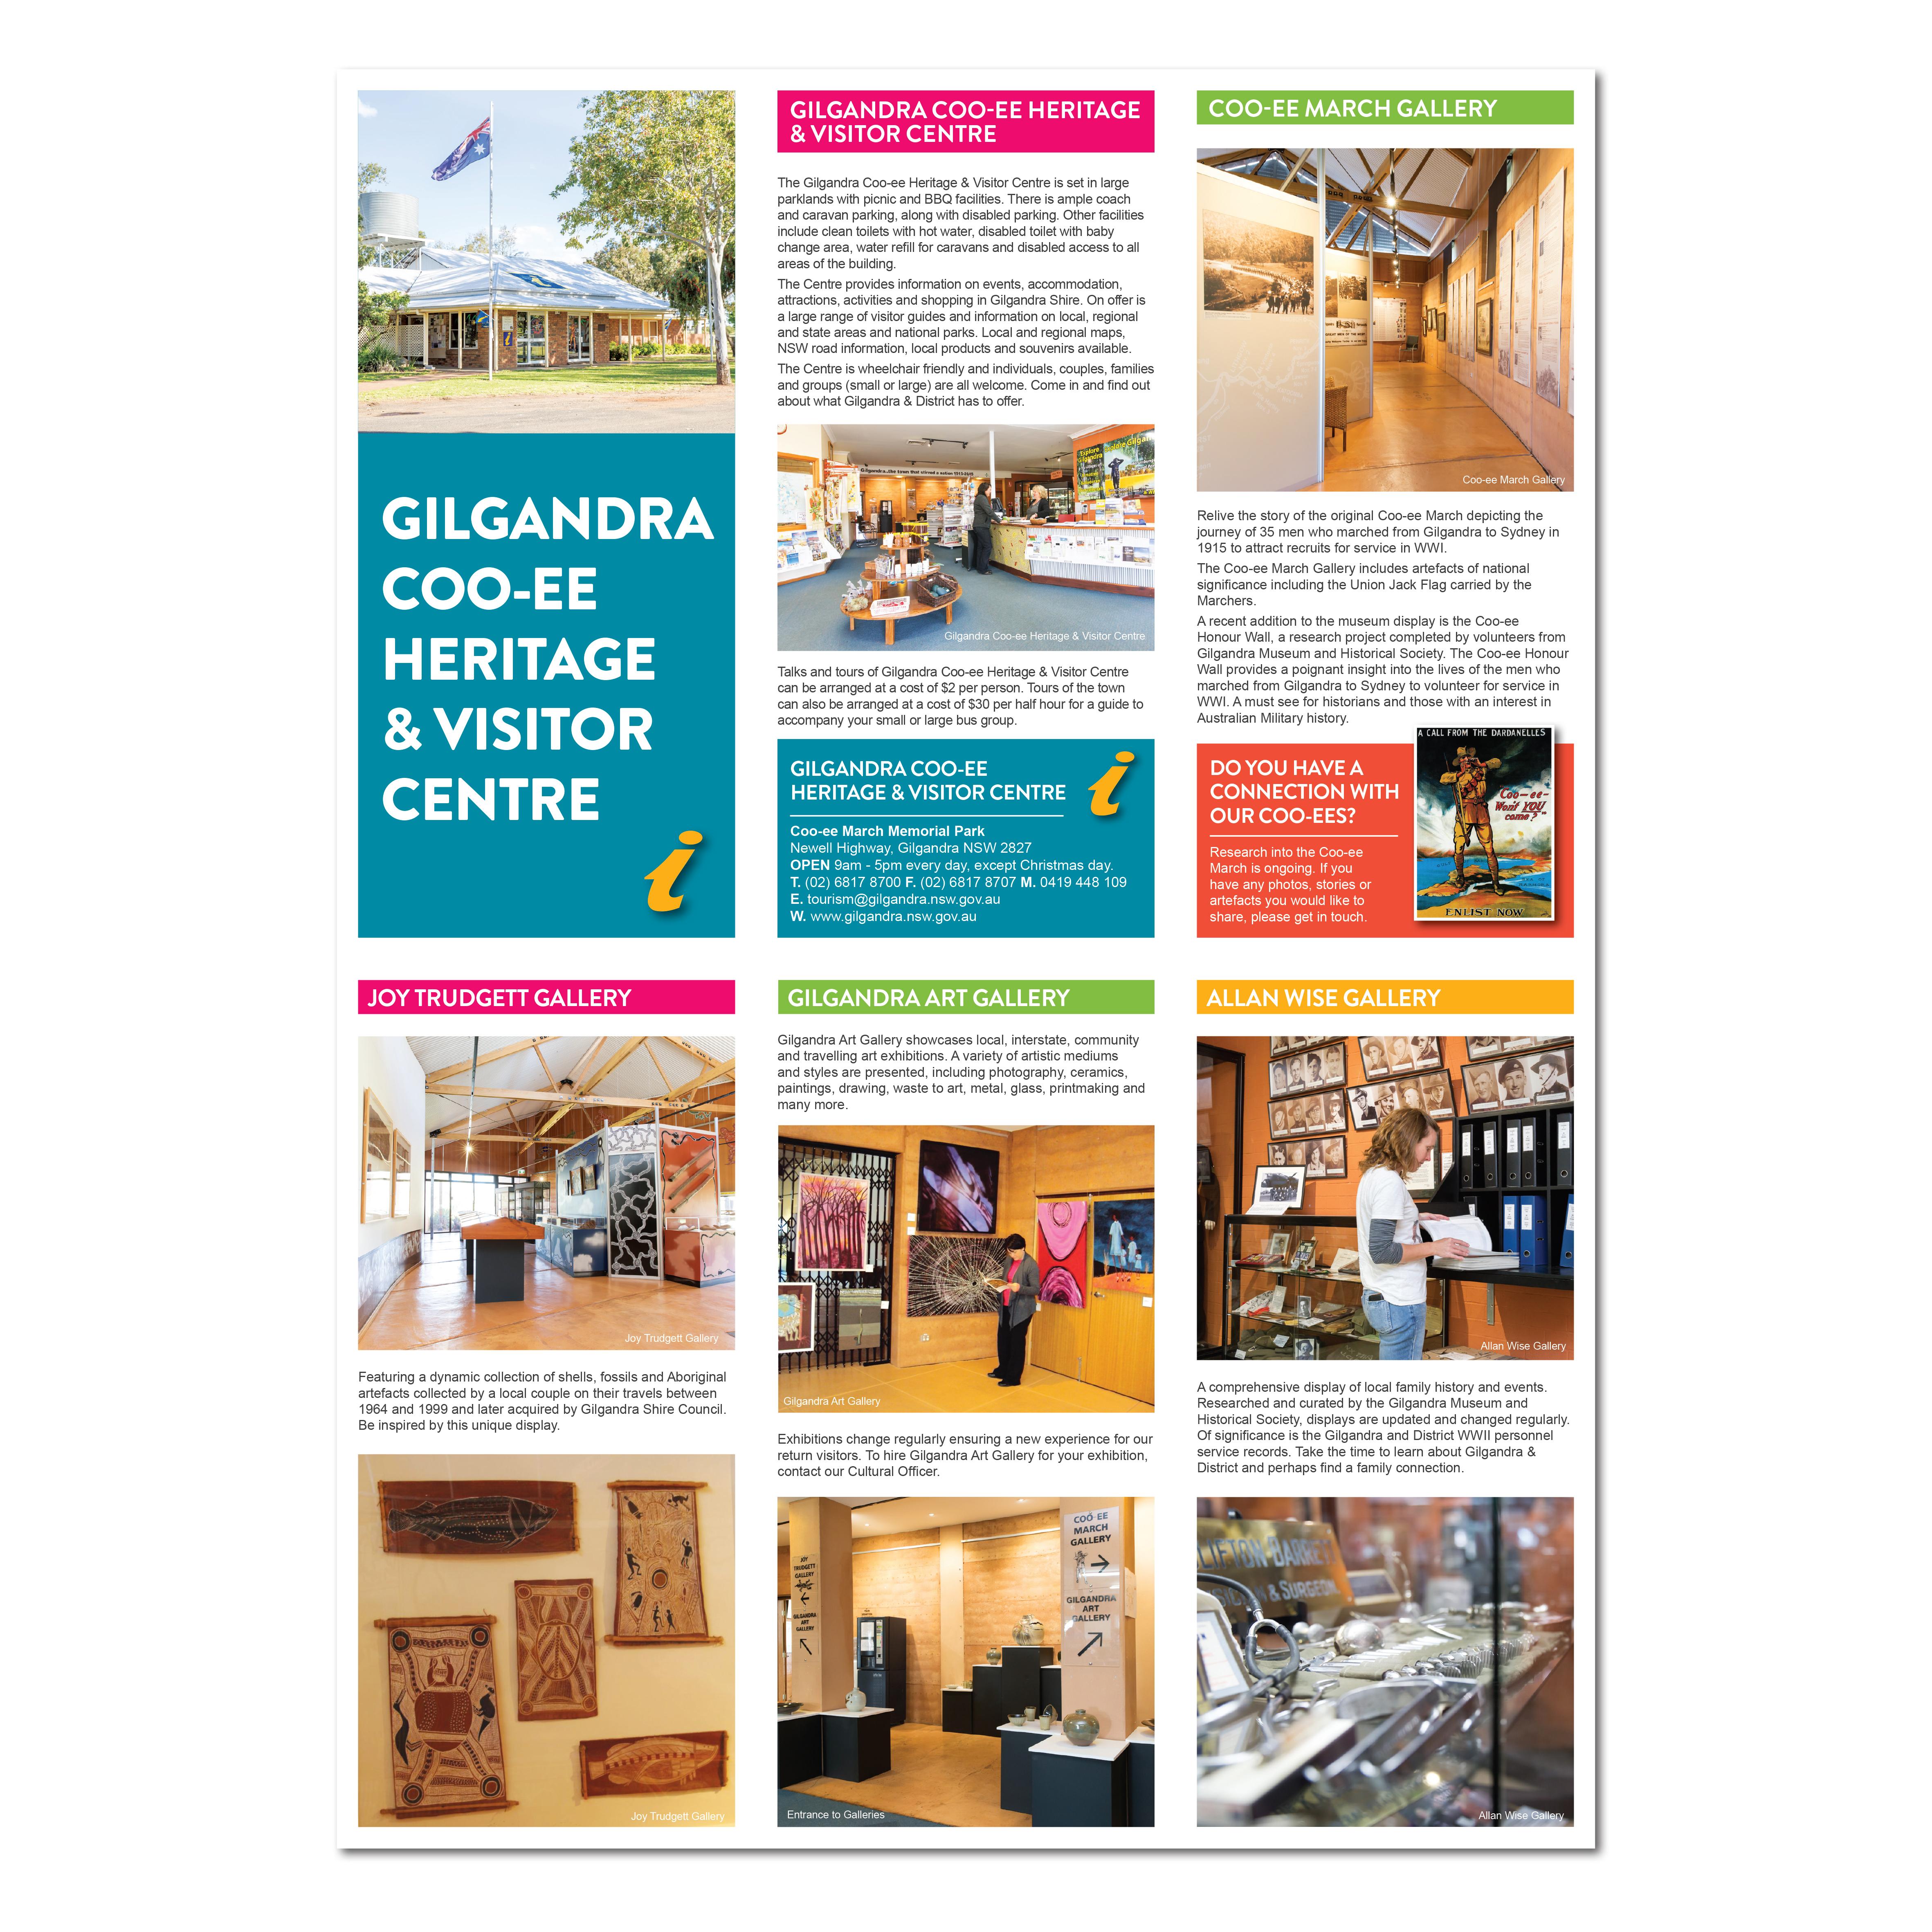 Gilgandra Heritage Centre Brochure